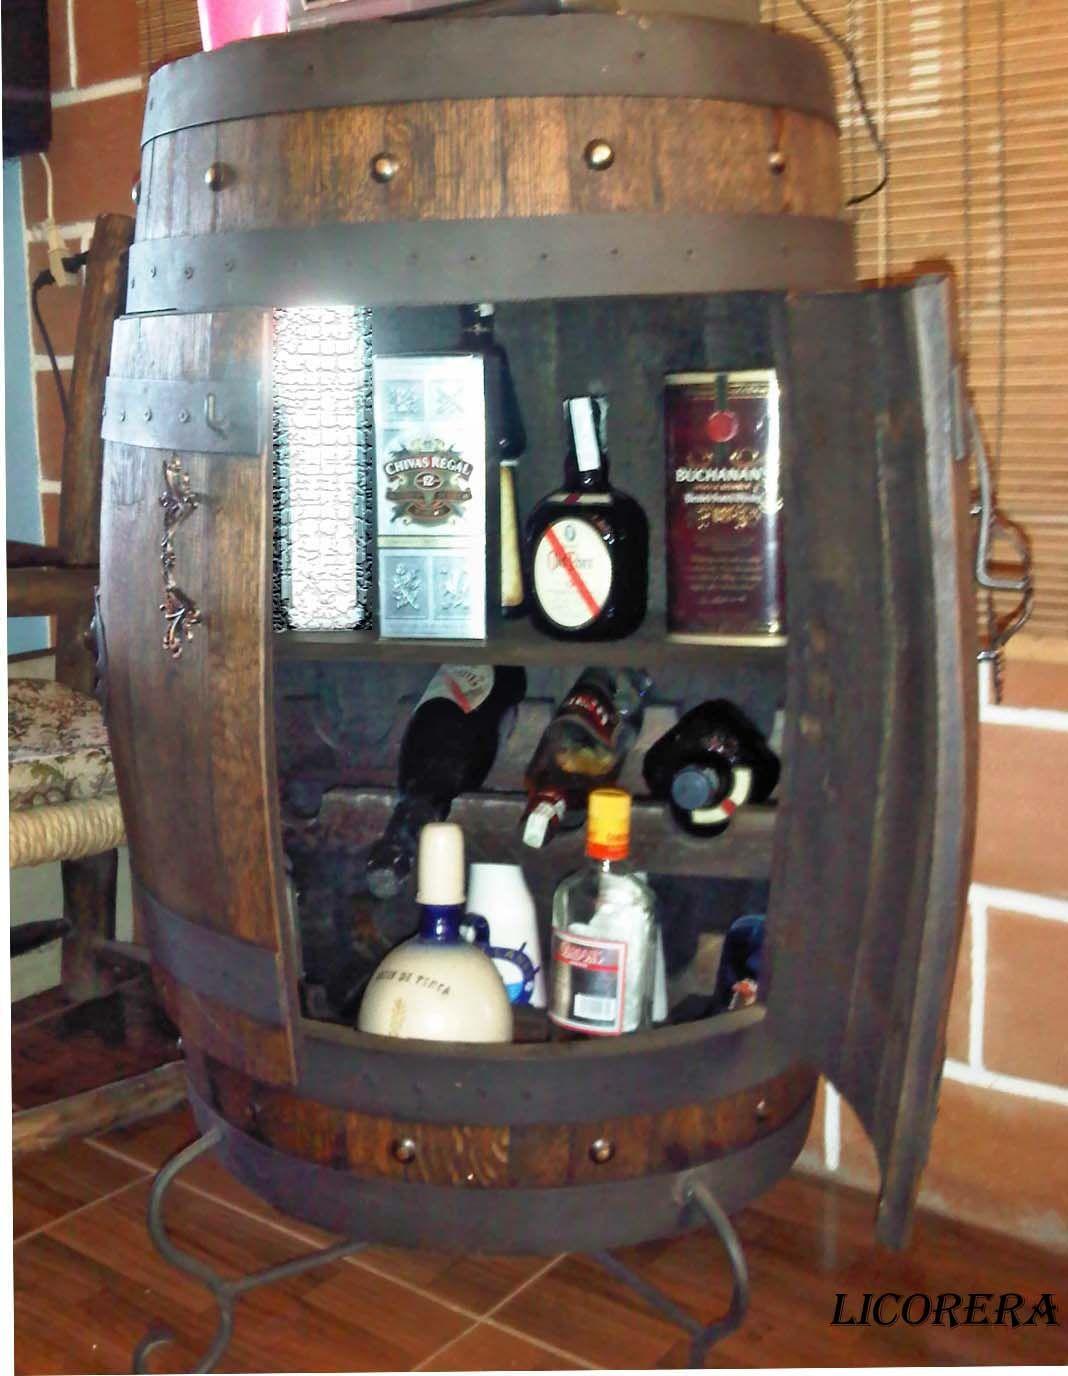 Licorera barril articulos elegantes y utiles pinterest for Barriles de madera bar